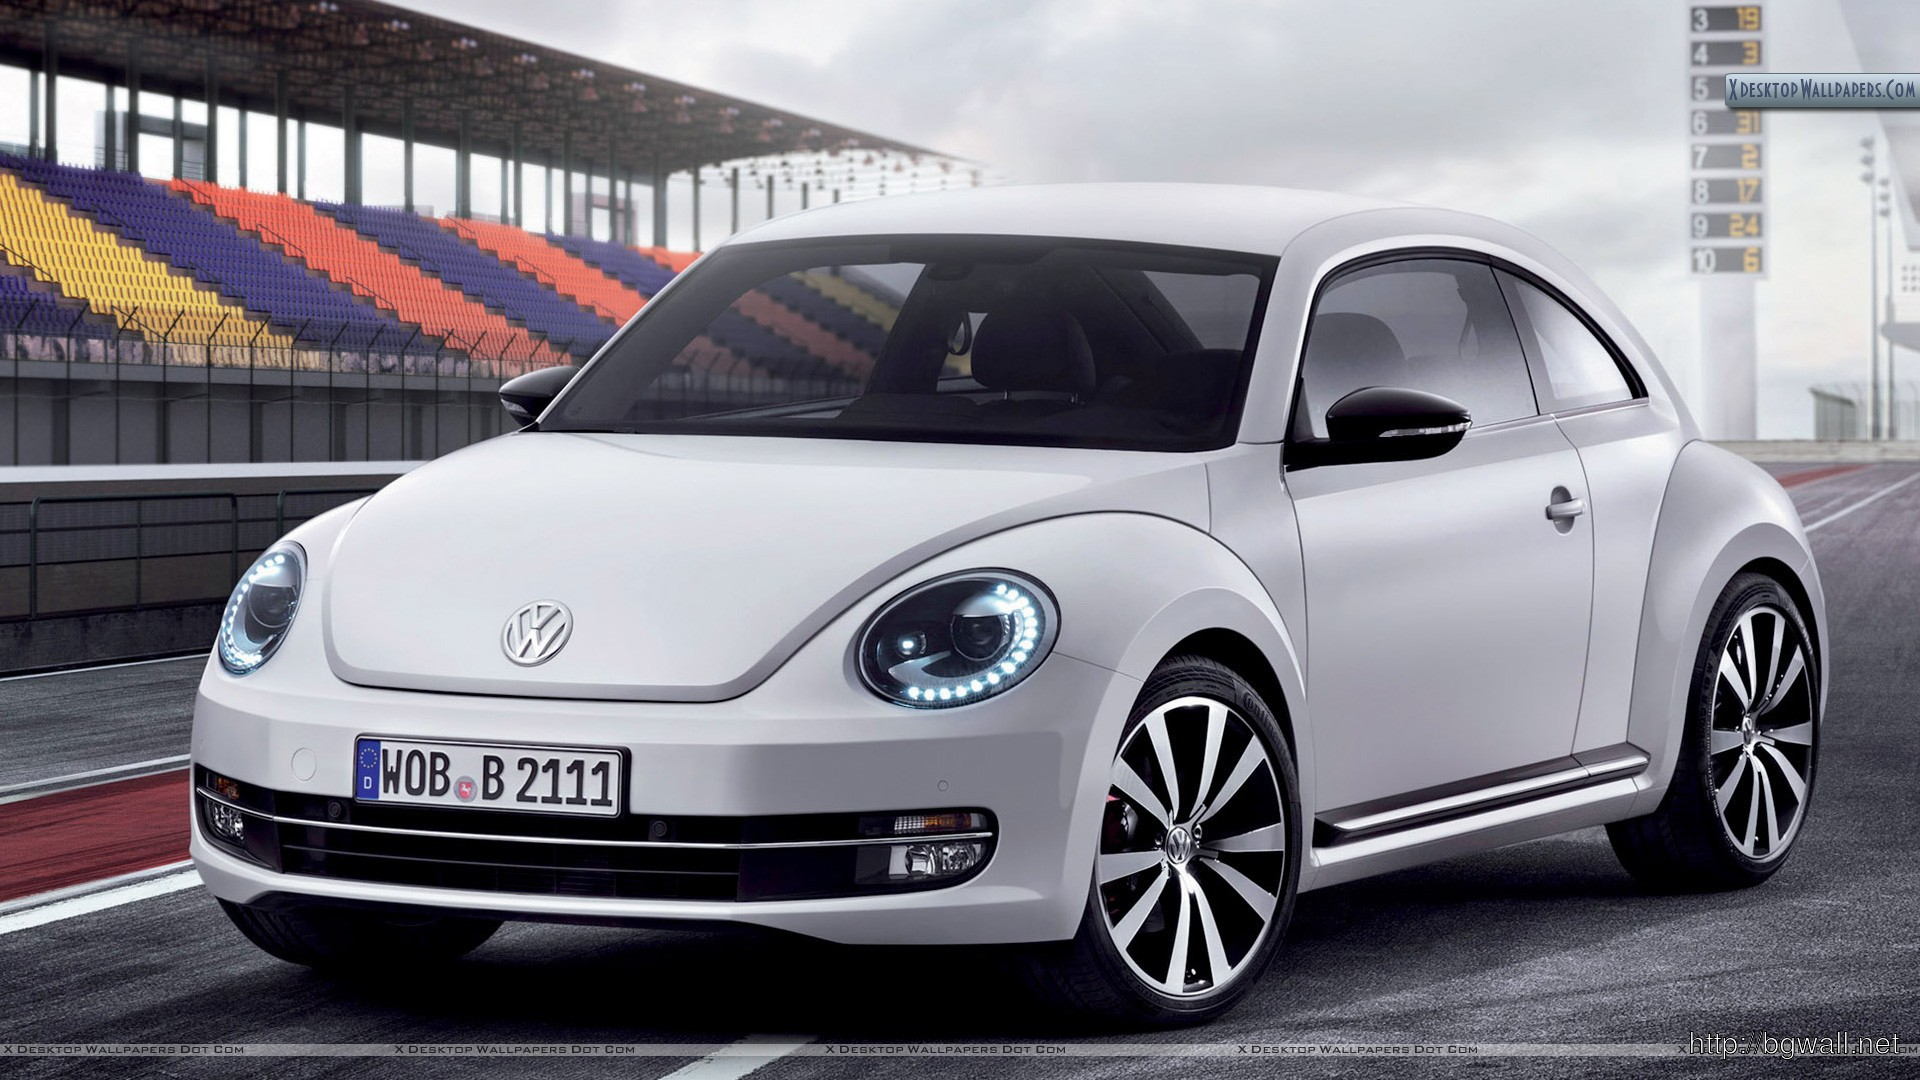 2012 Volkswagen Beetle On Race Course Wallpaper Full Size